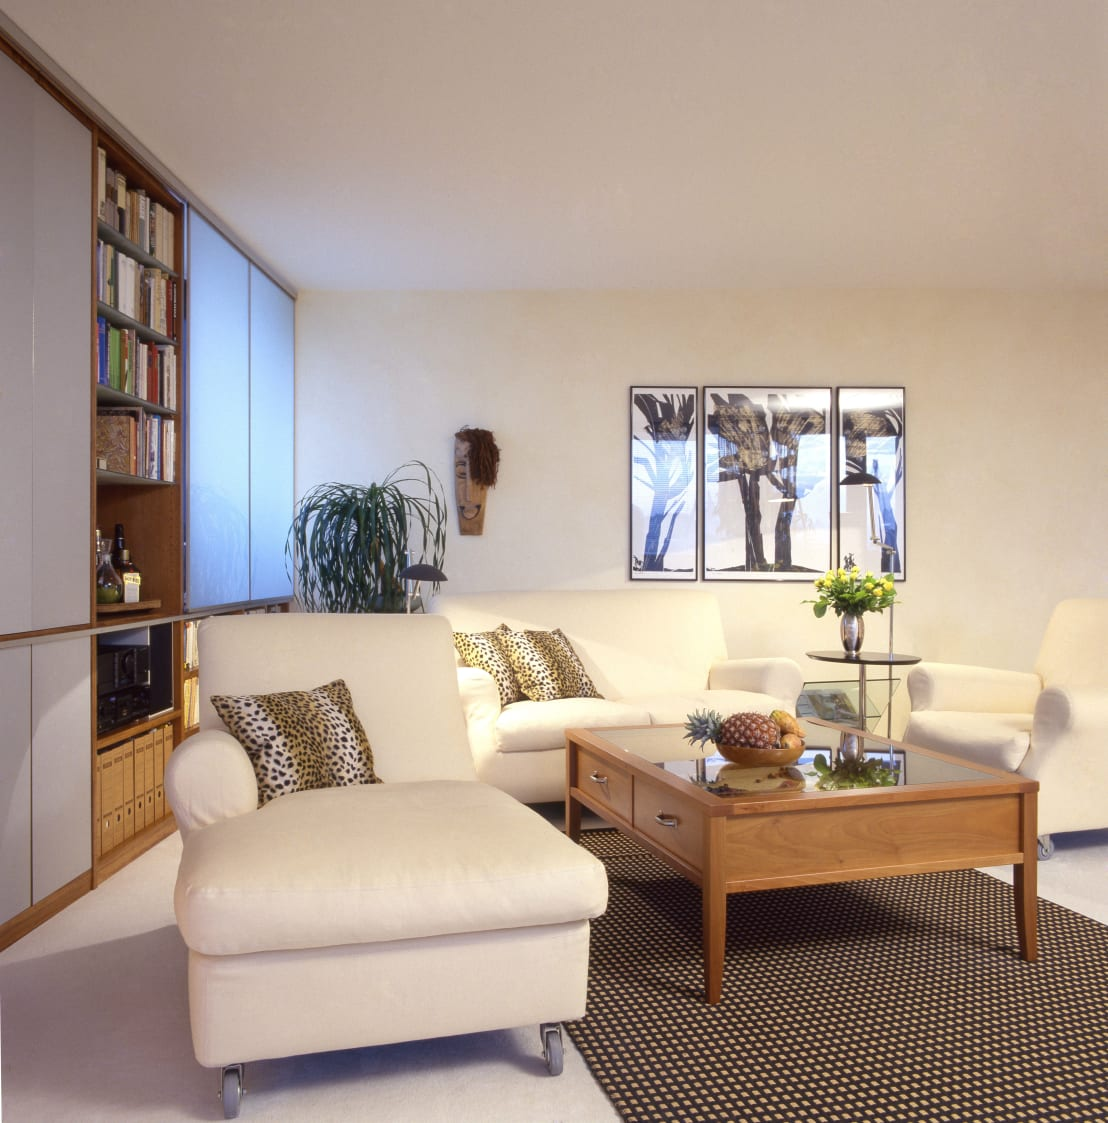 wohnung im olympiadorf m nchen by planung raum design anne batisweiler homify. Black Bedroom Furniture Sets. Home Design Ideas